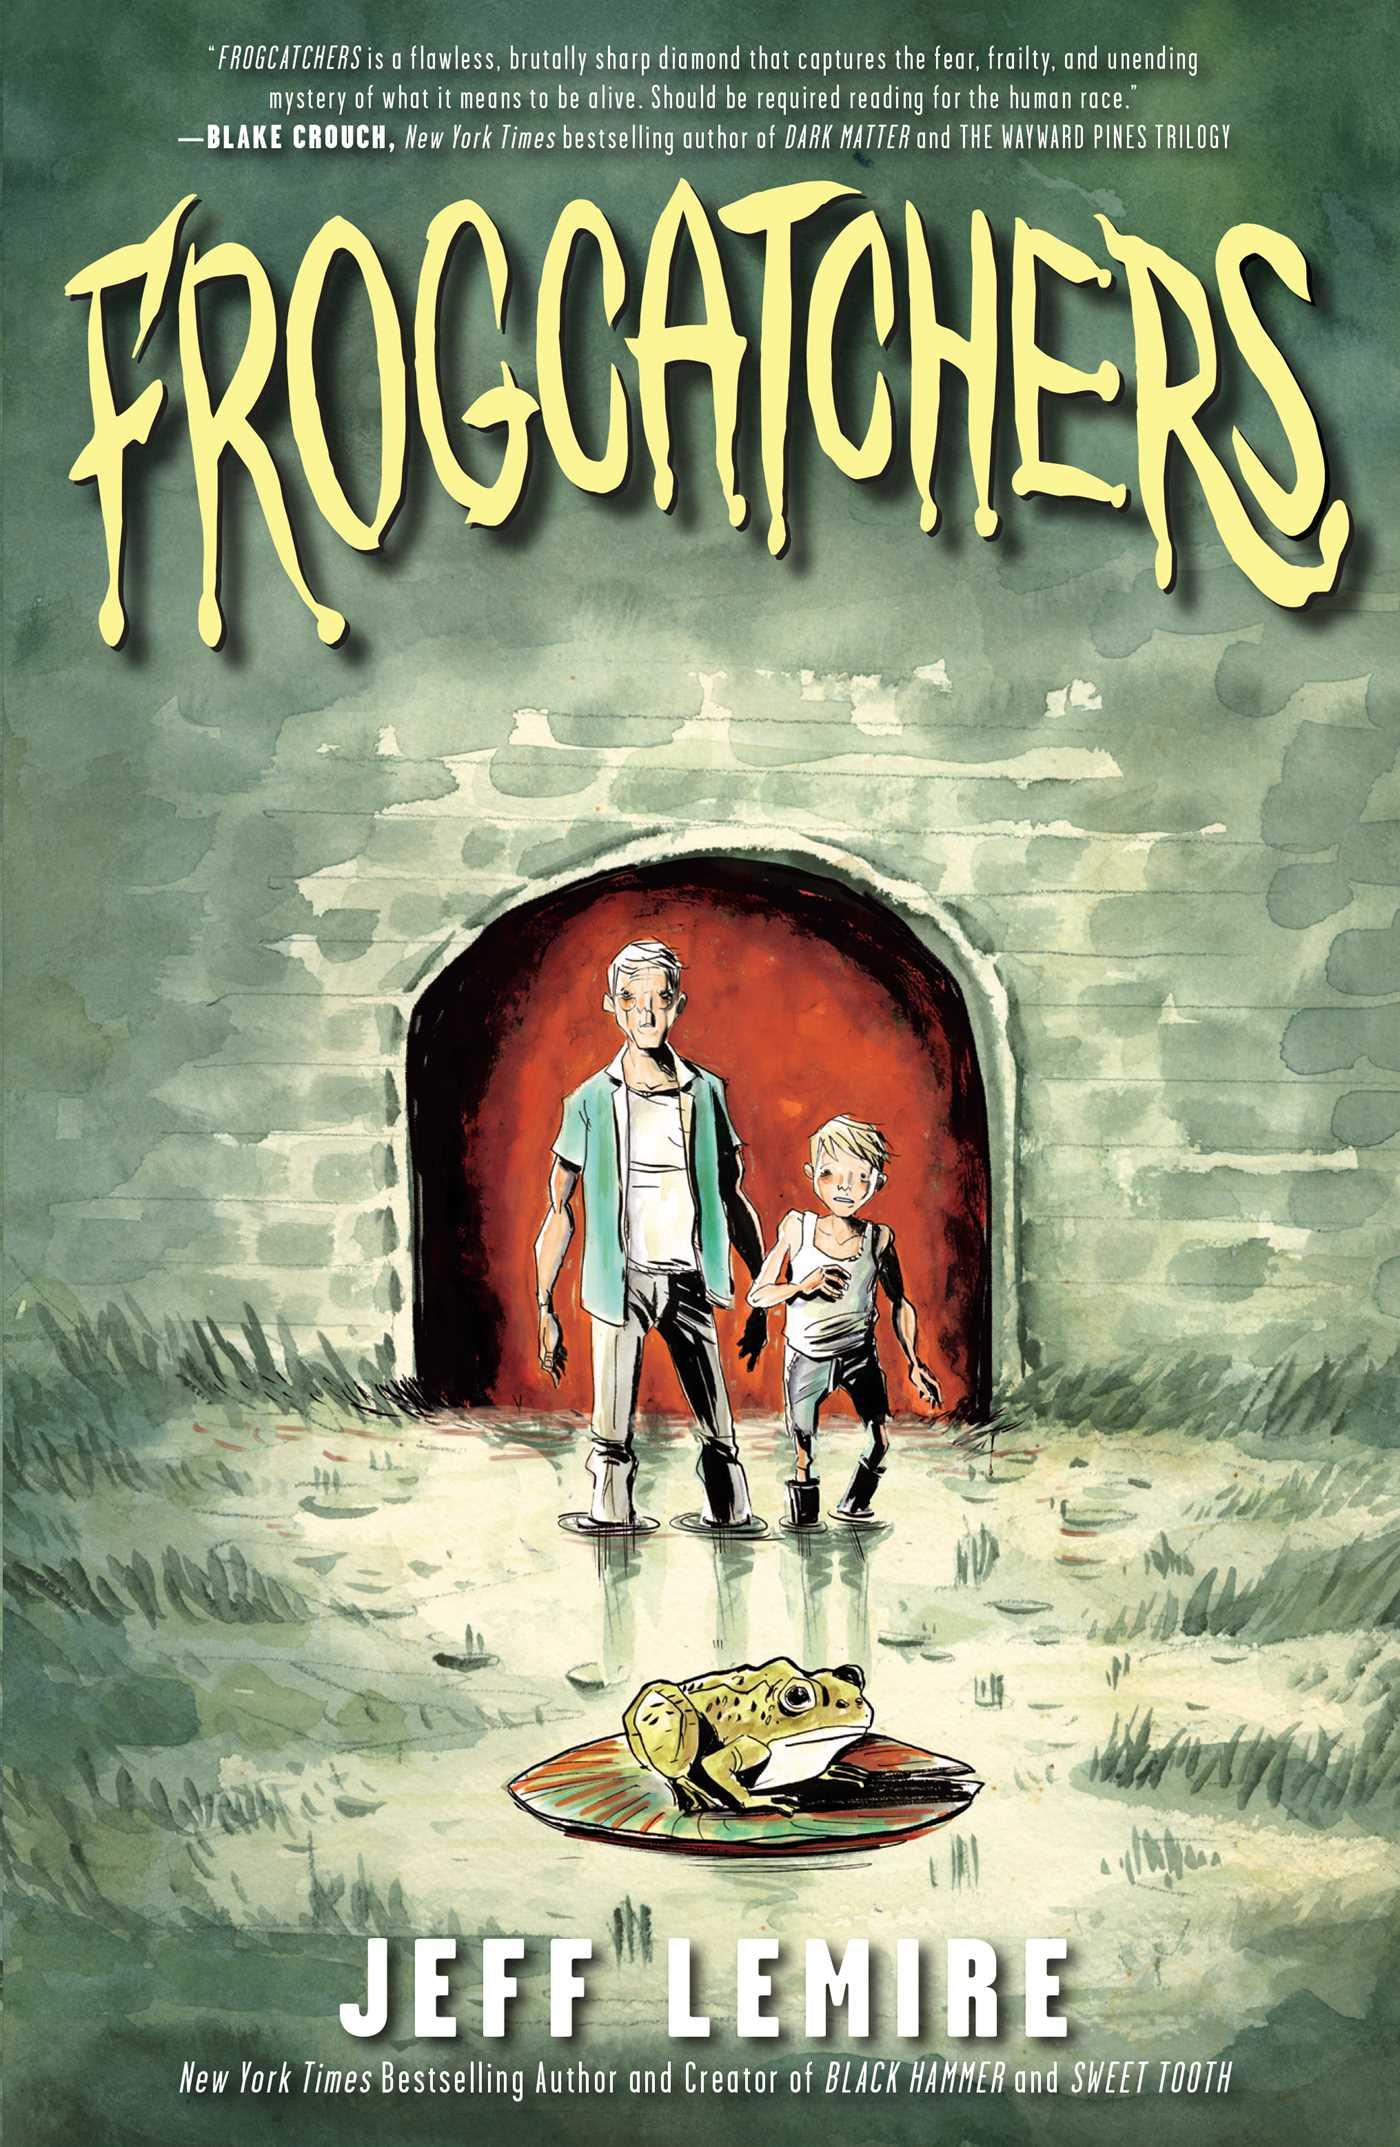 Frogcatchers, Jeff Lemire